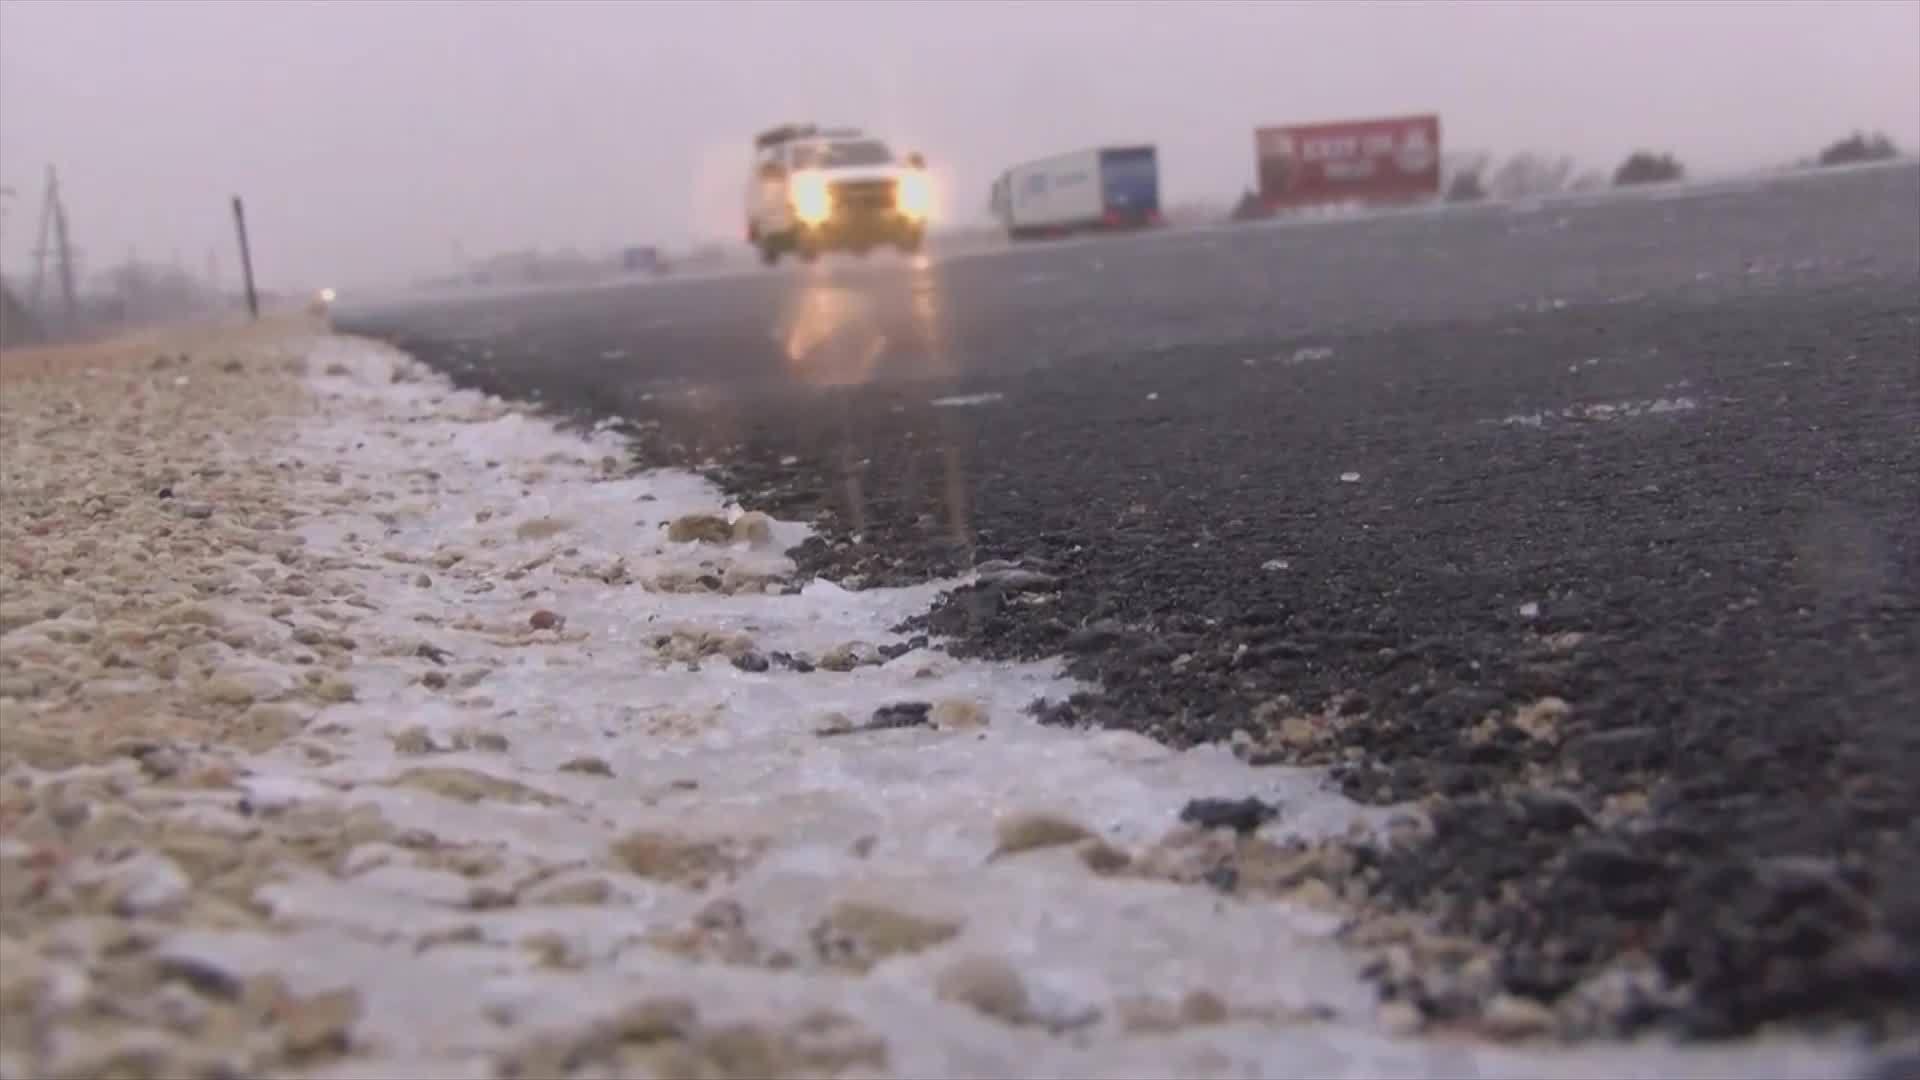 Winter Weather Travel